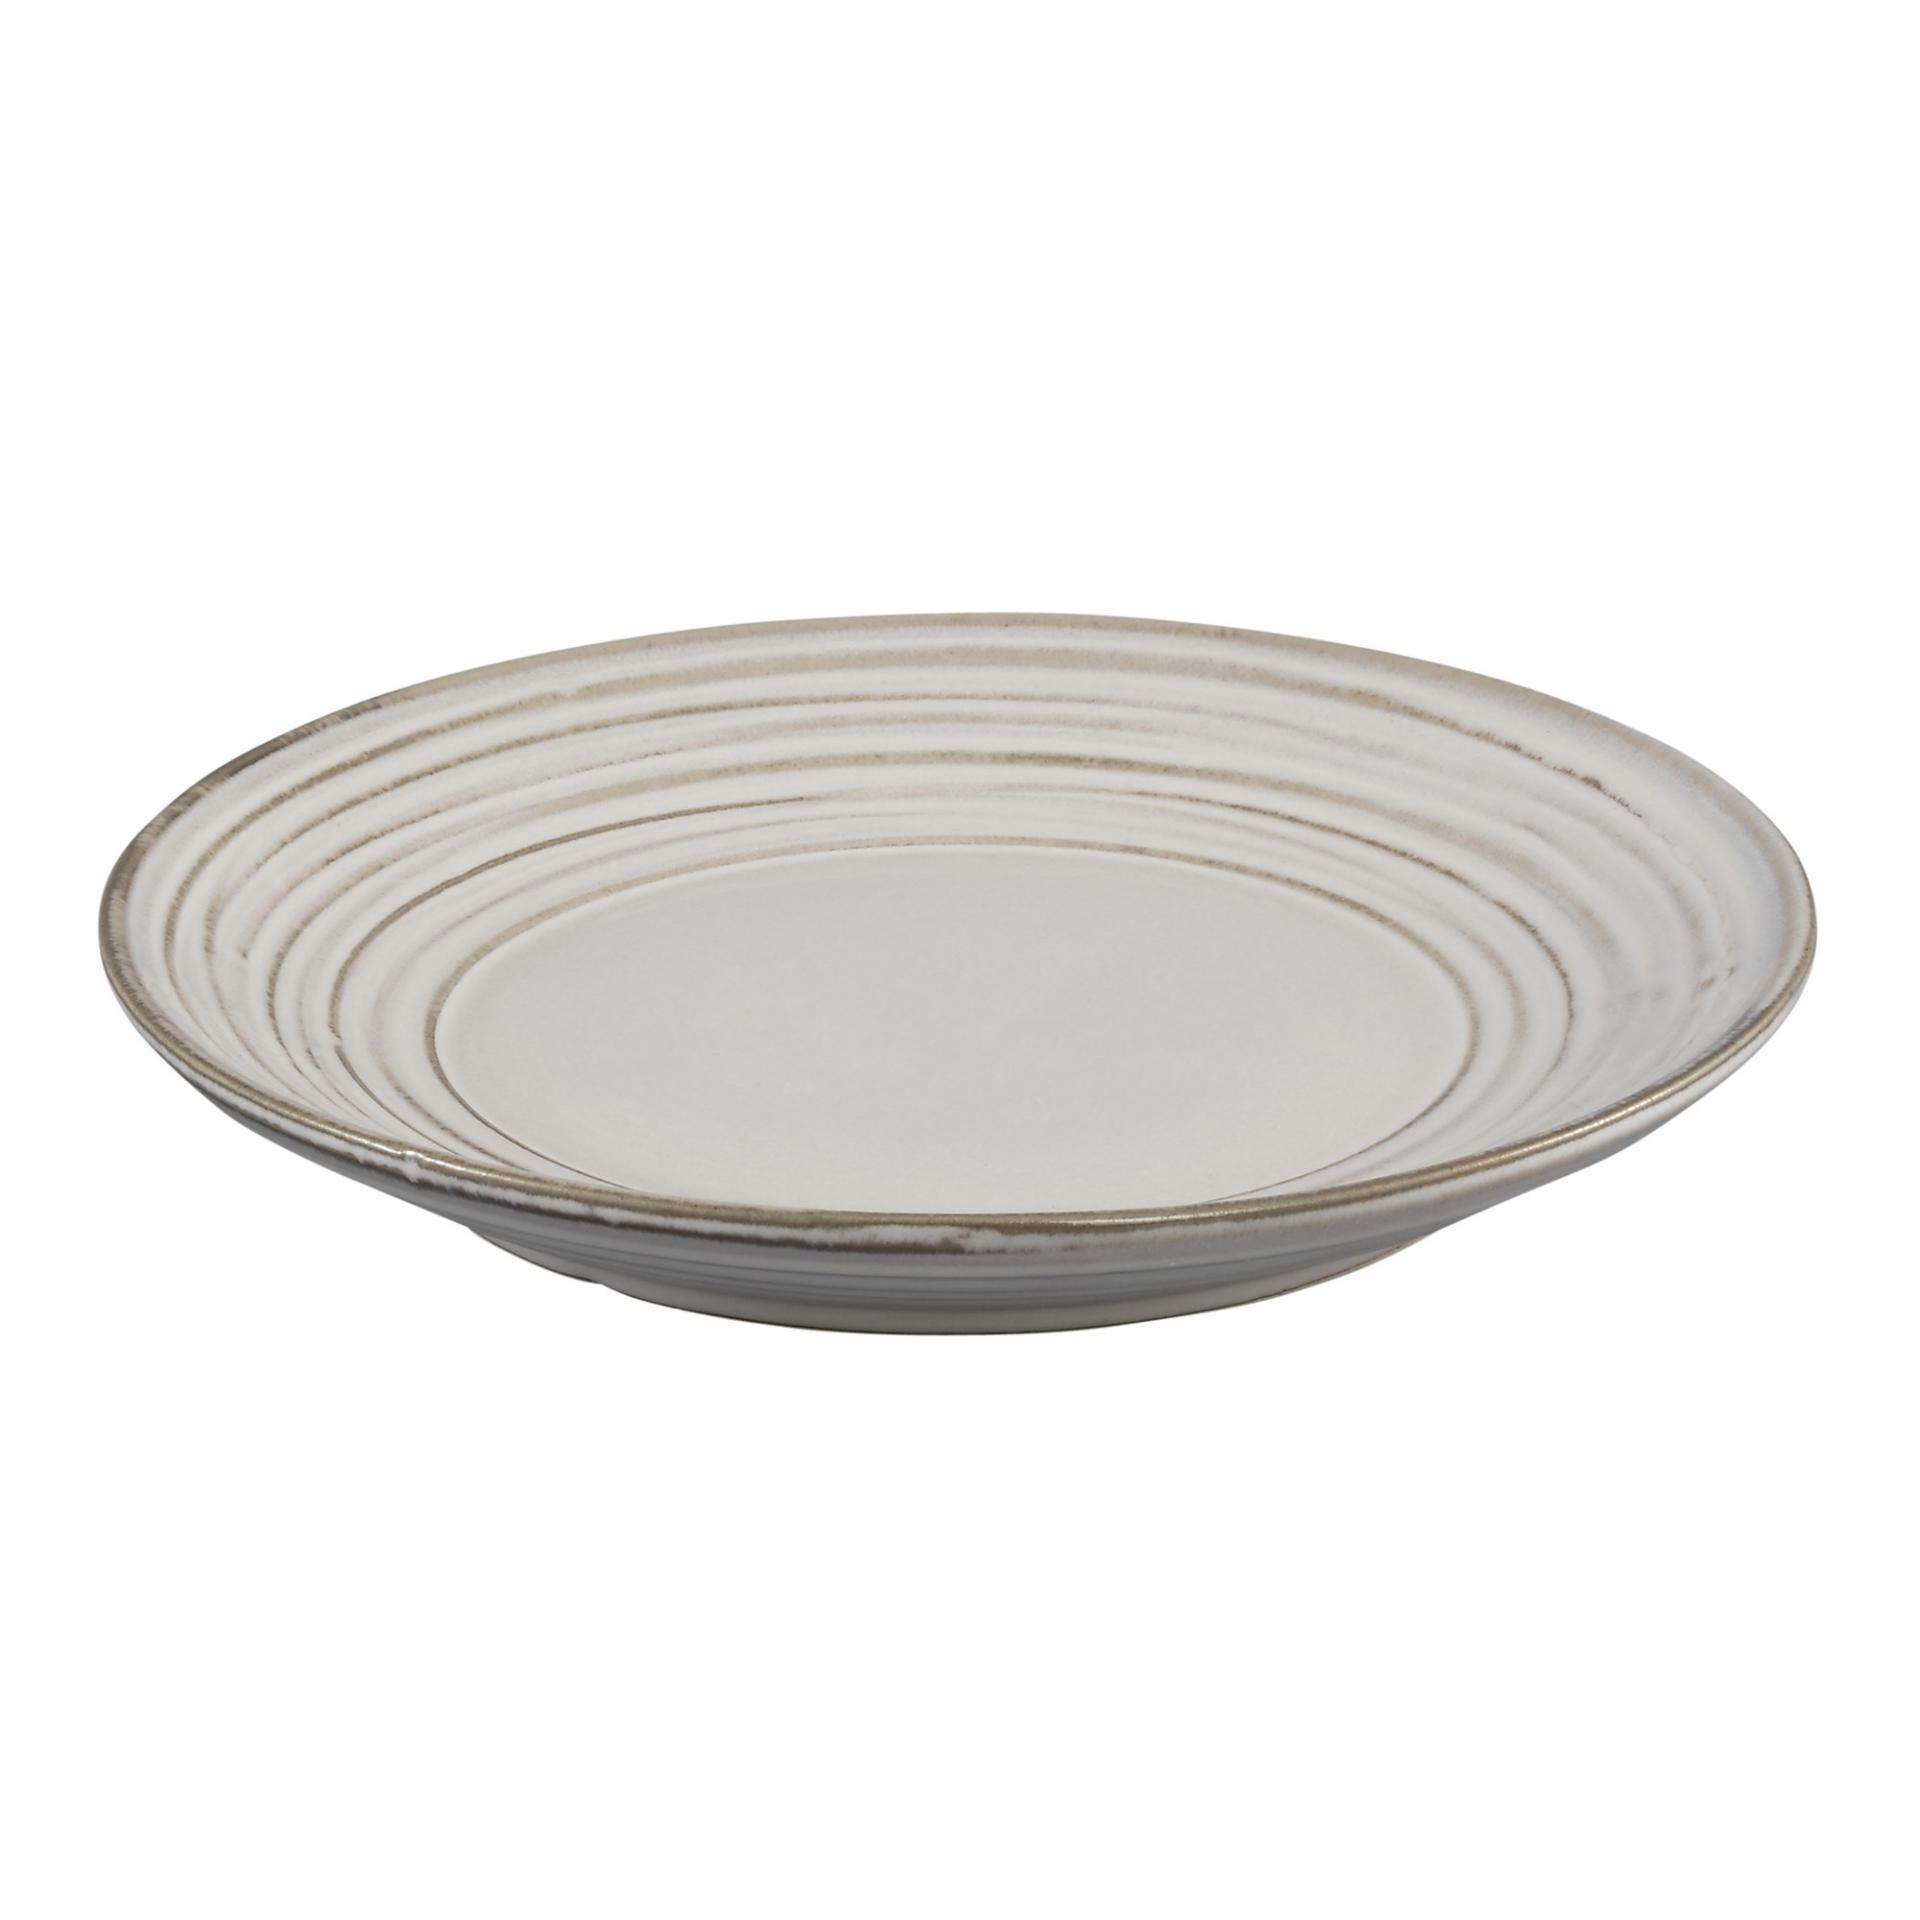 PTMD674594 Sakari ceramic plate S